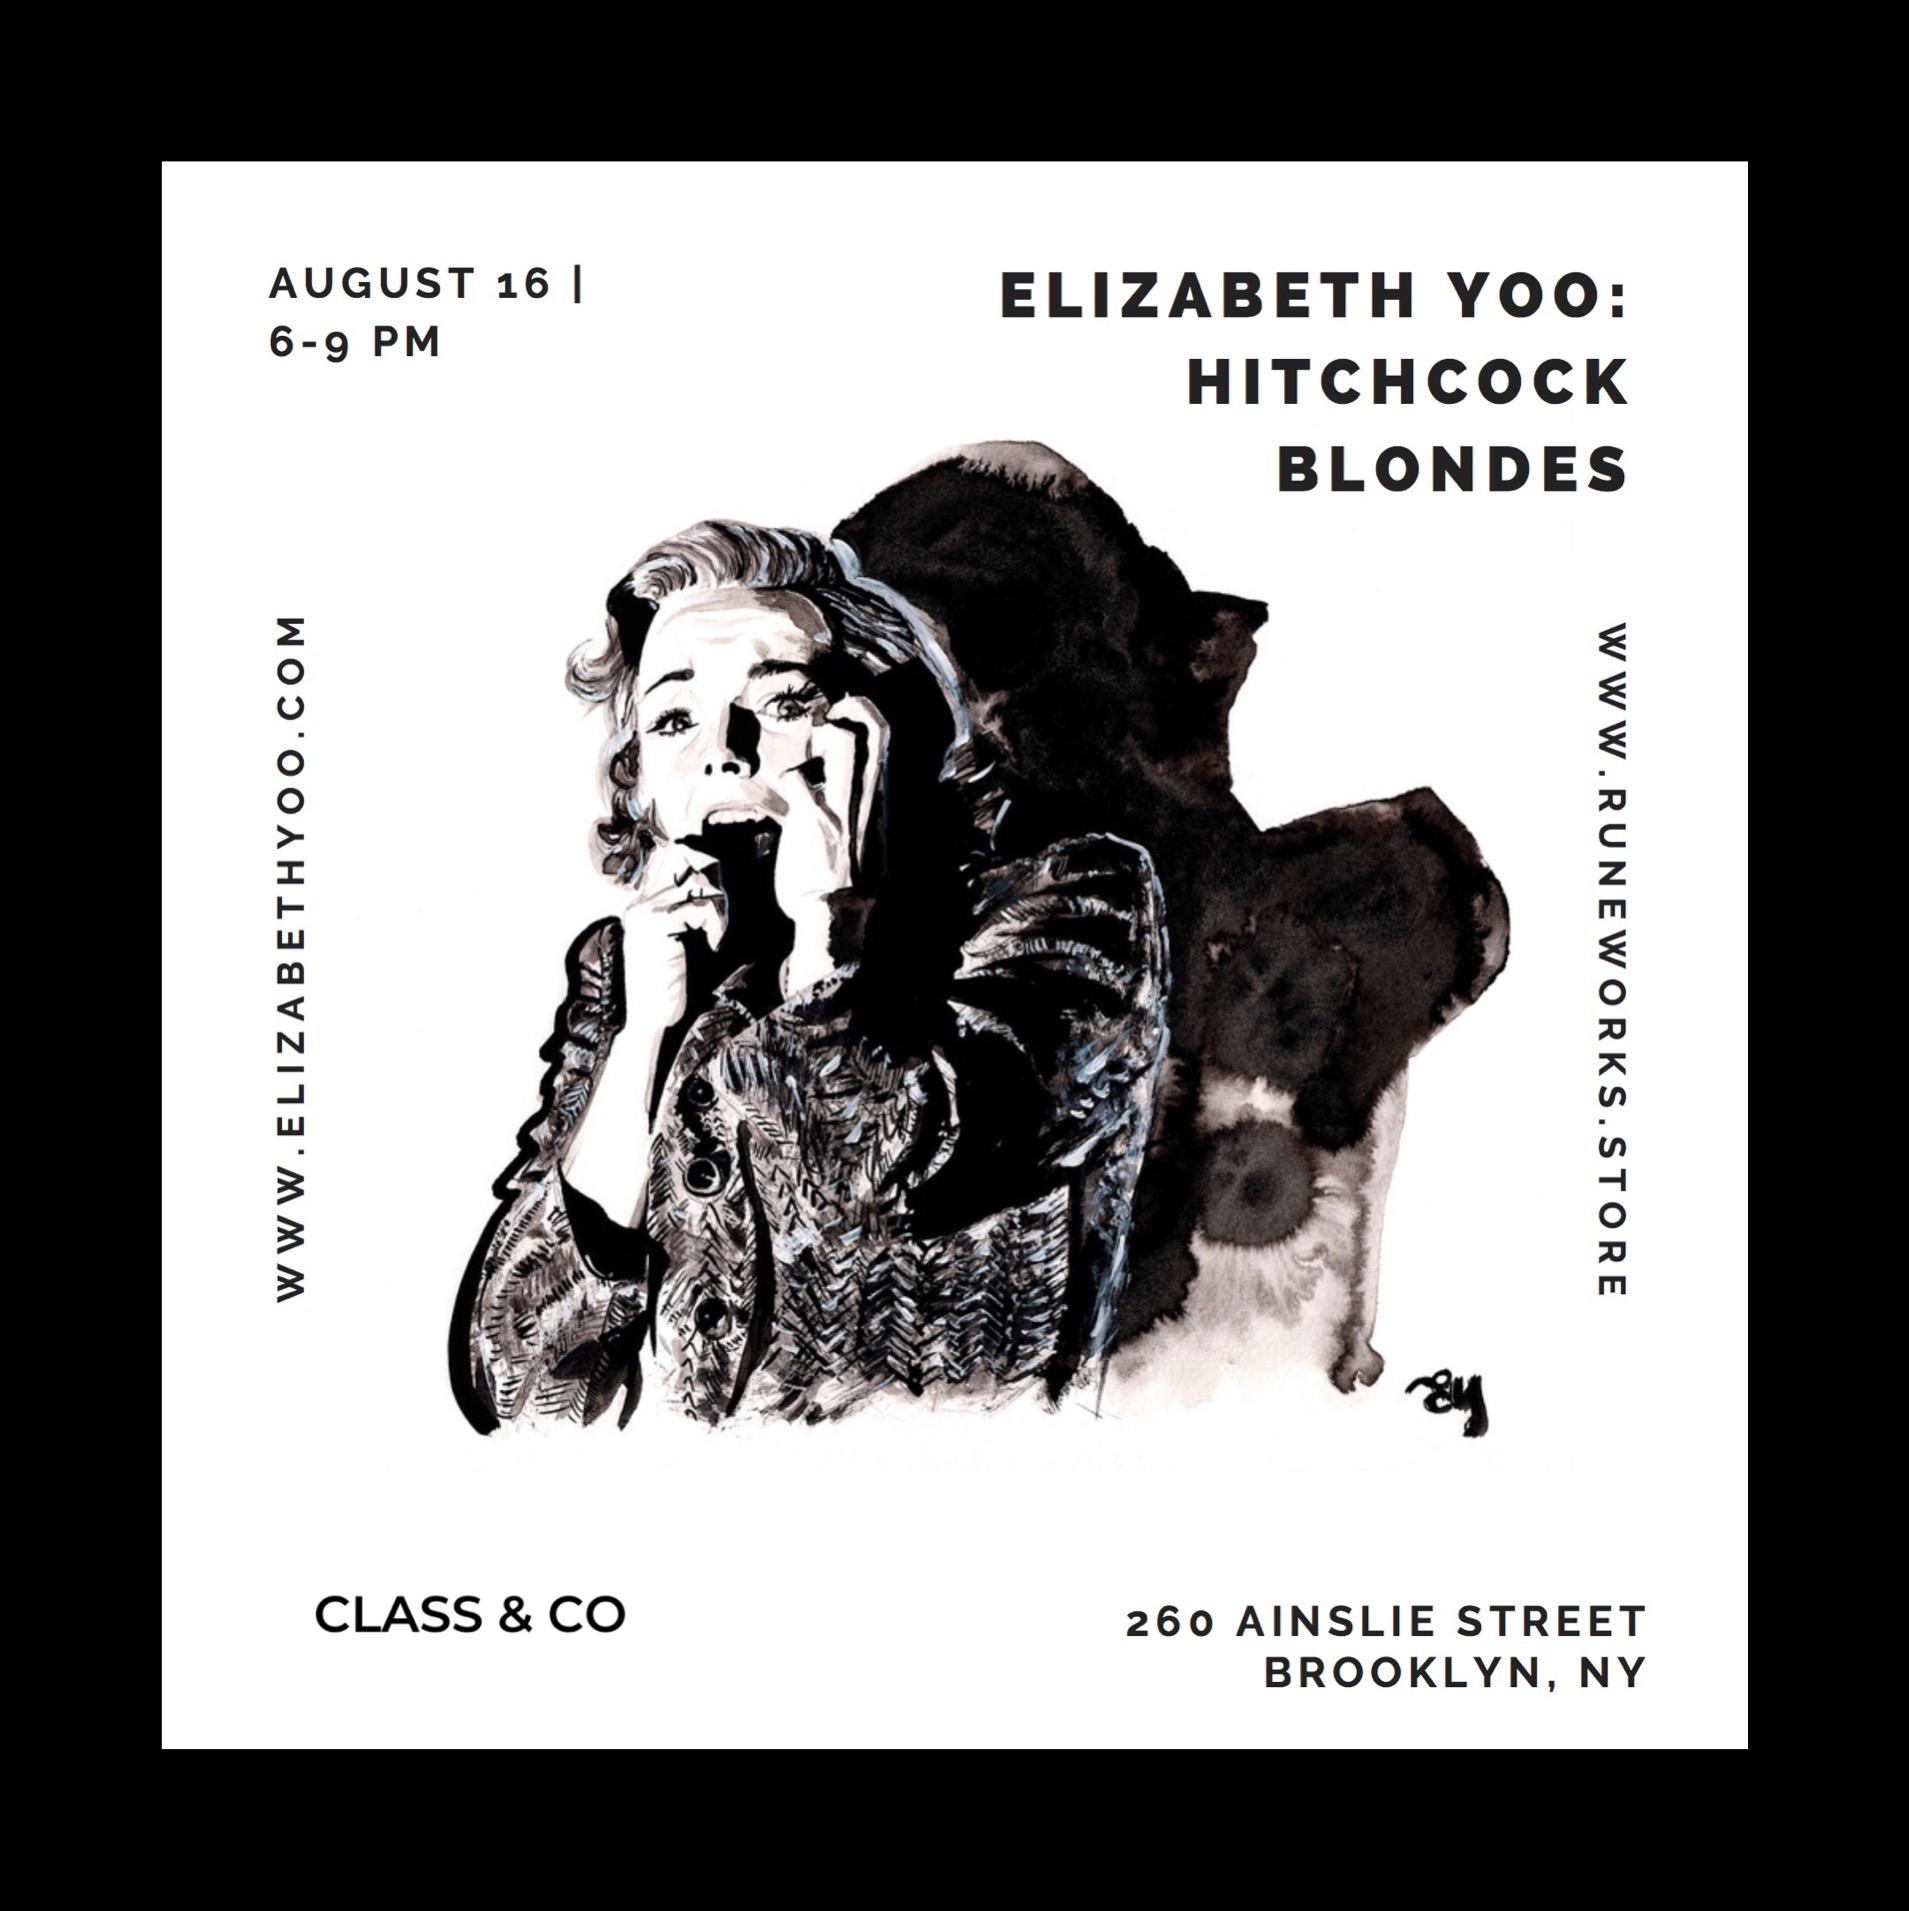 HitchcockBlondes_InstagramEdit